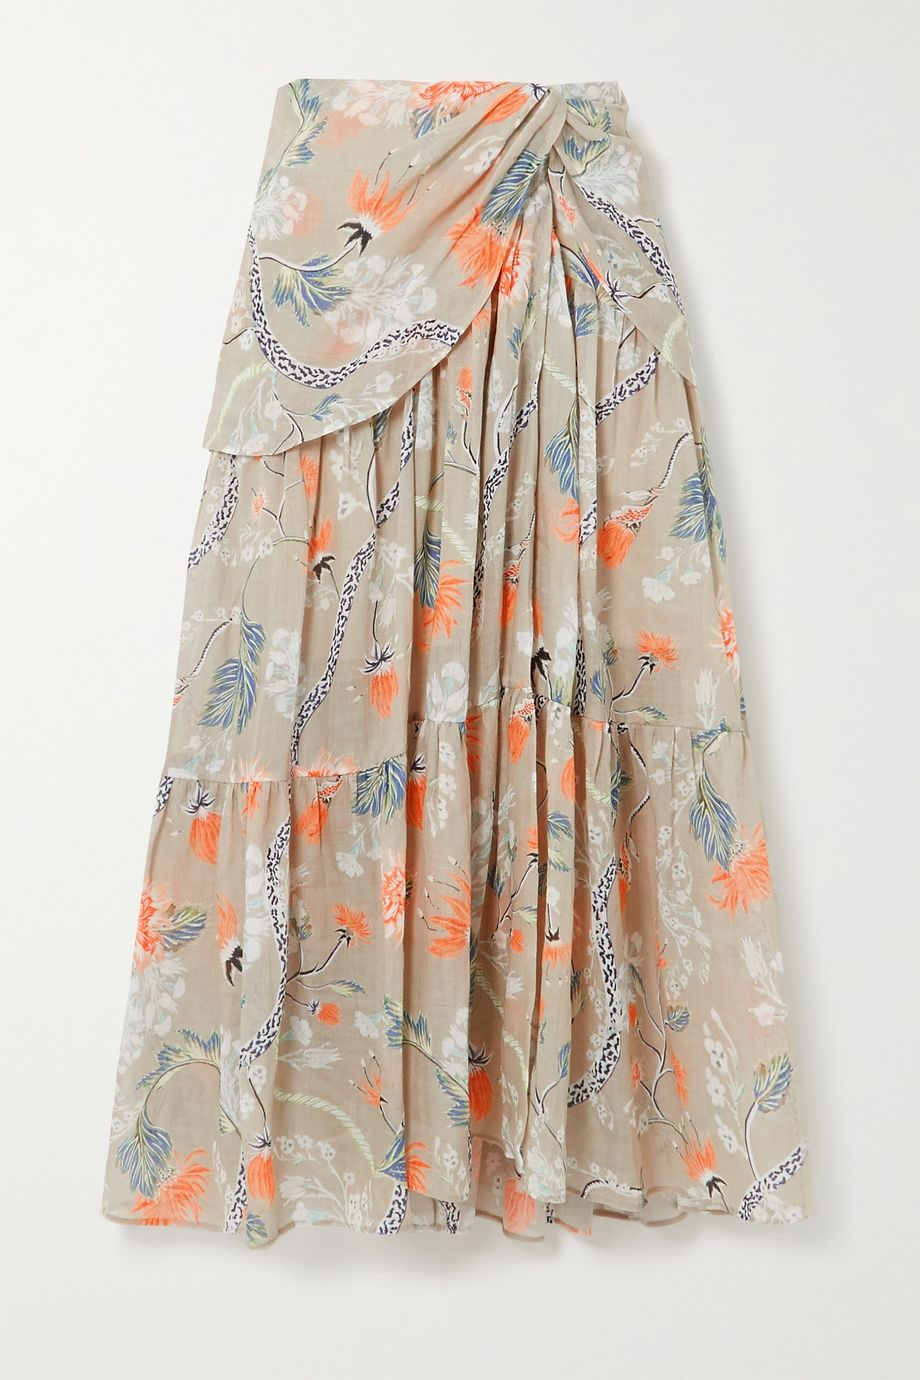 Chloé Ruched floral-print ramie midi skirt